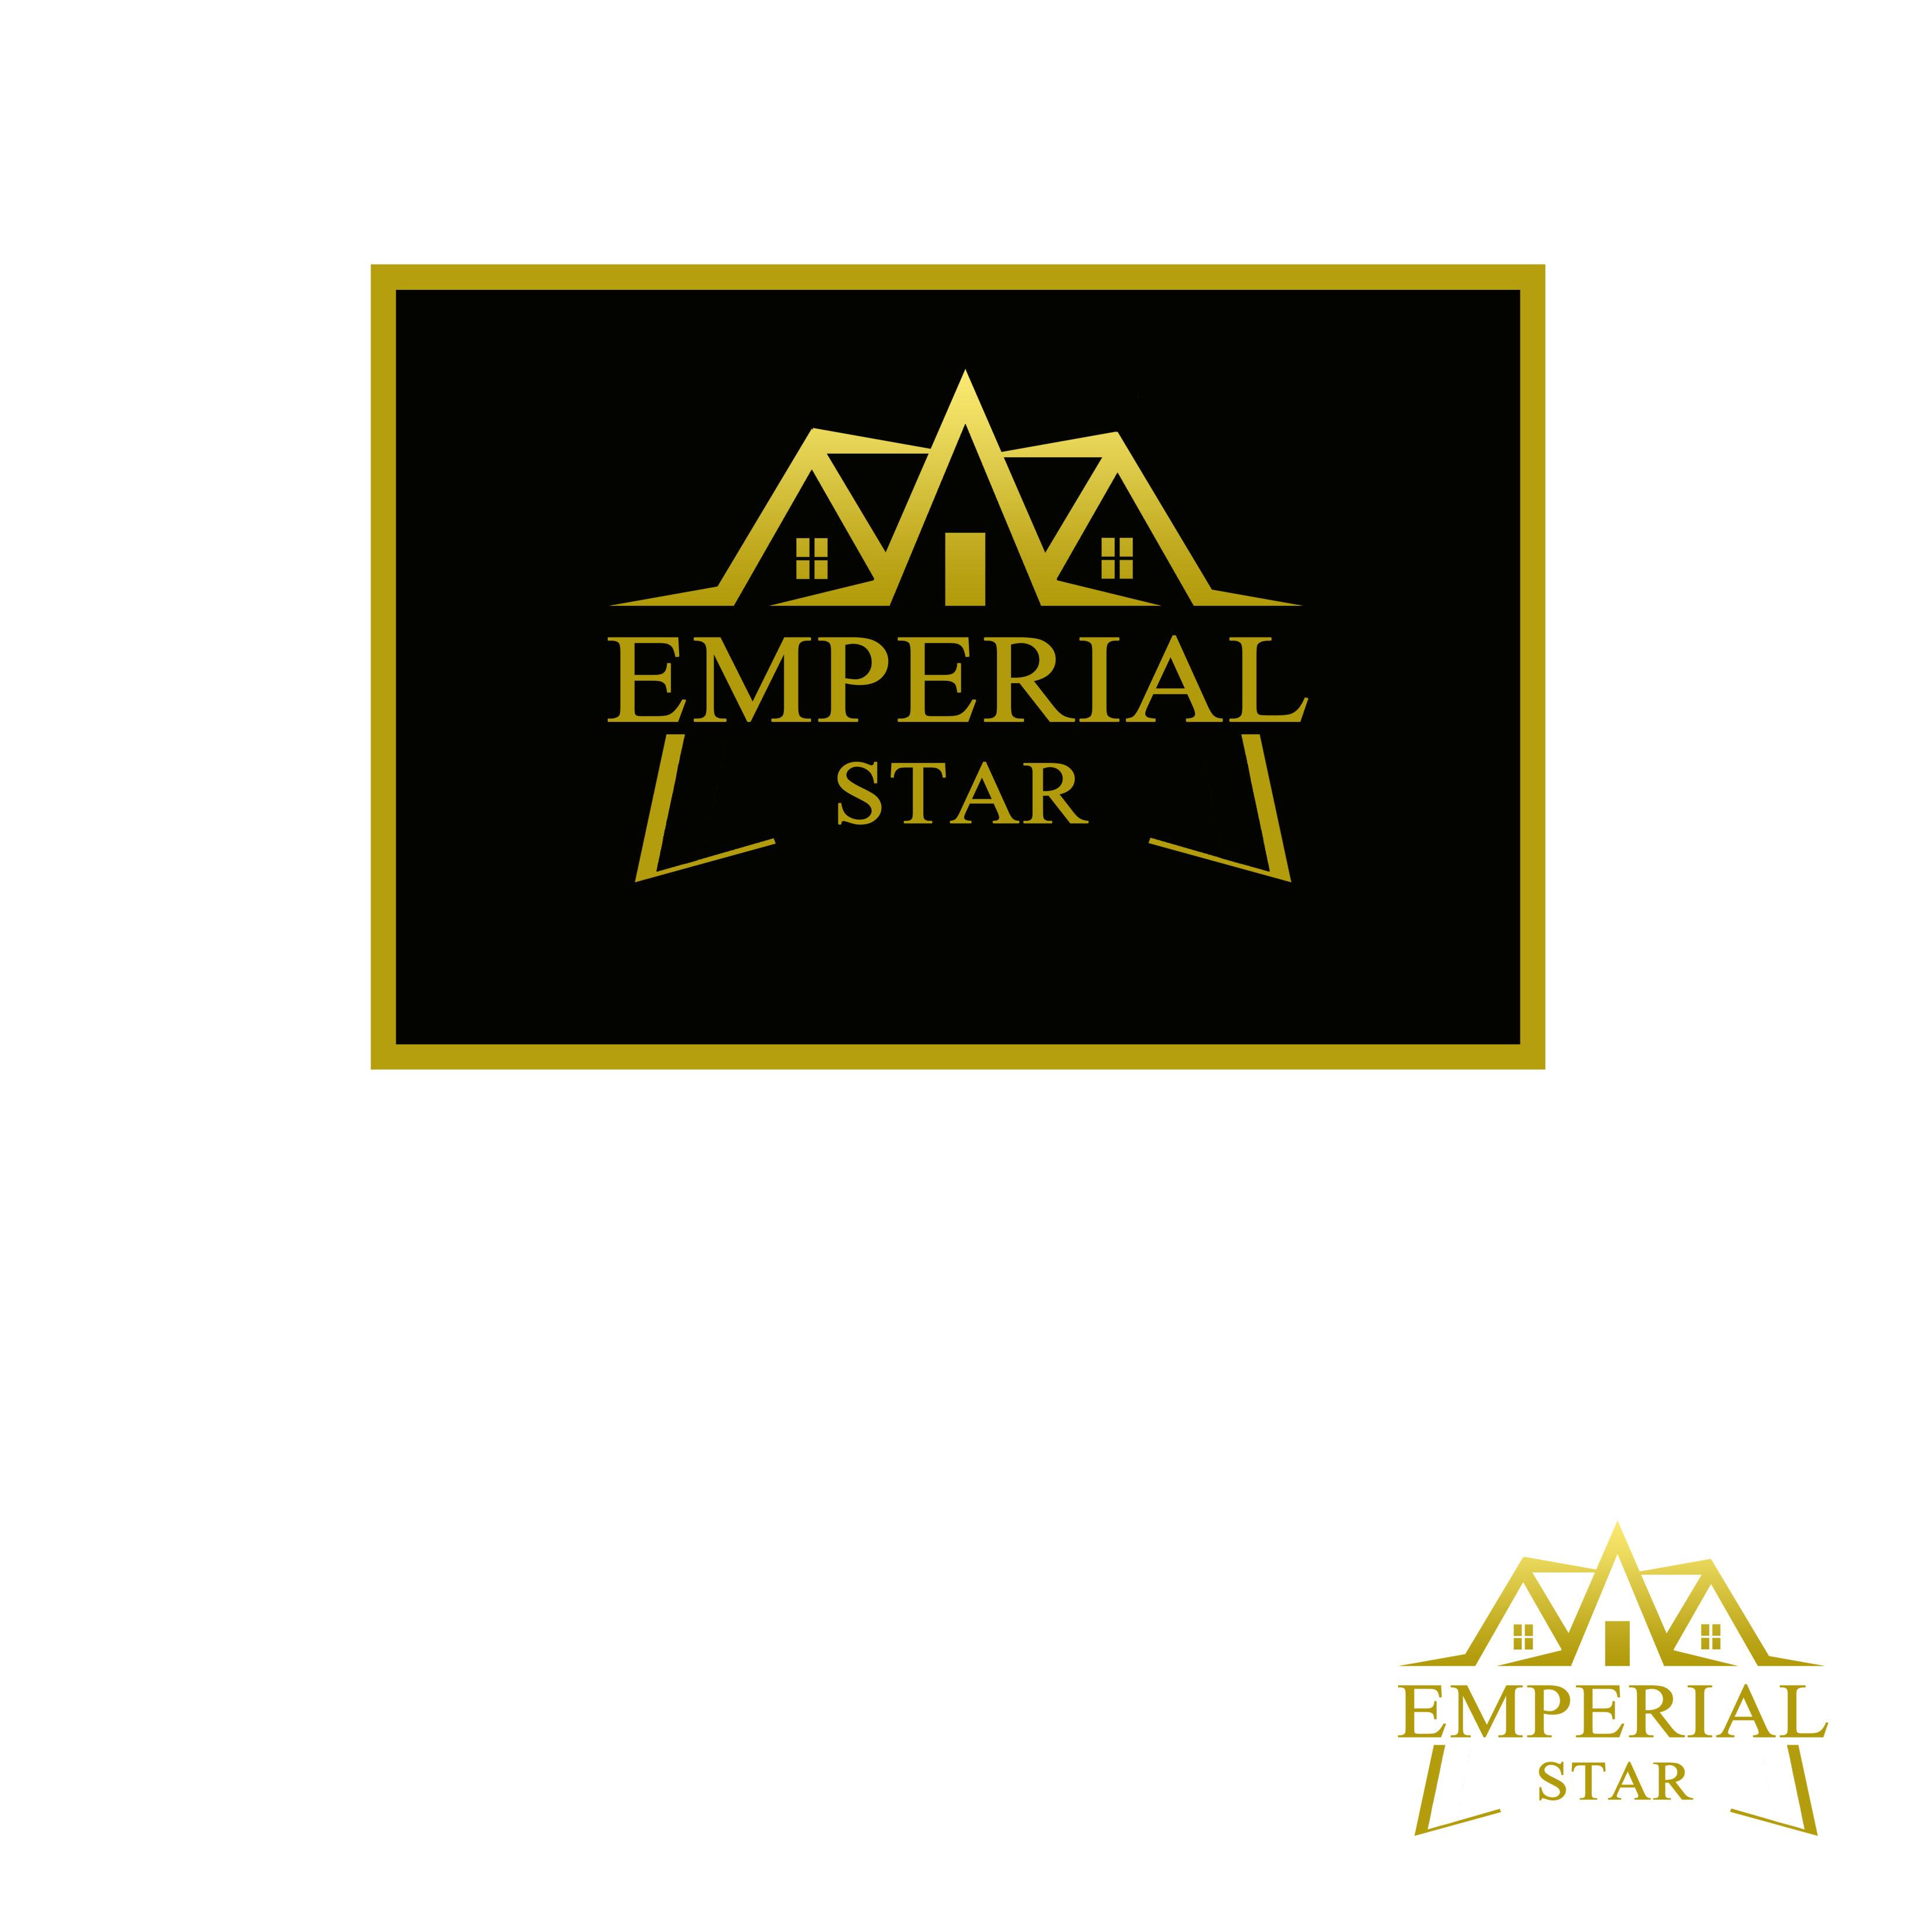 Logo Design by Mary Ann Esclamado - Entry No. 55 in the Logo Design Contest Emperial Star Logo Design.